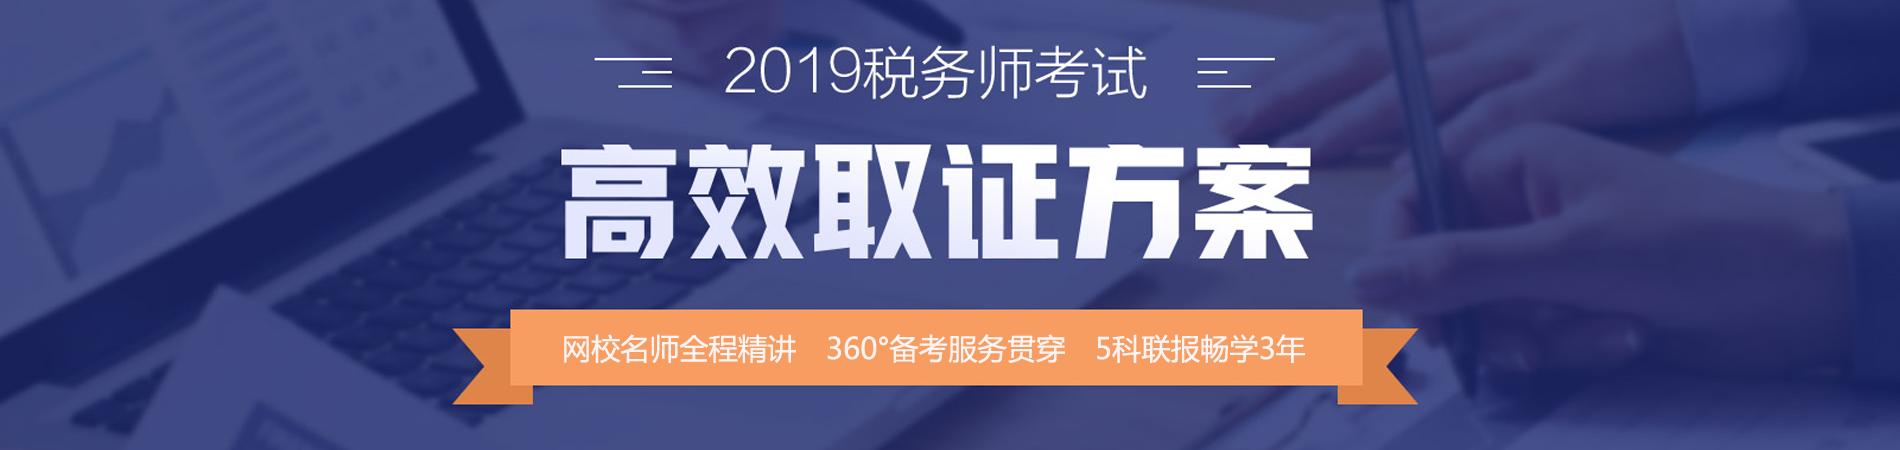 2019注税冲刺班